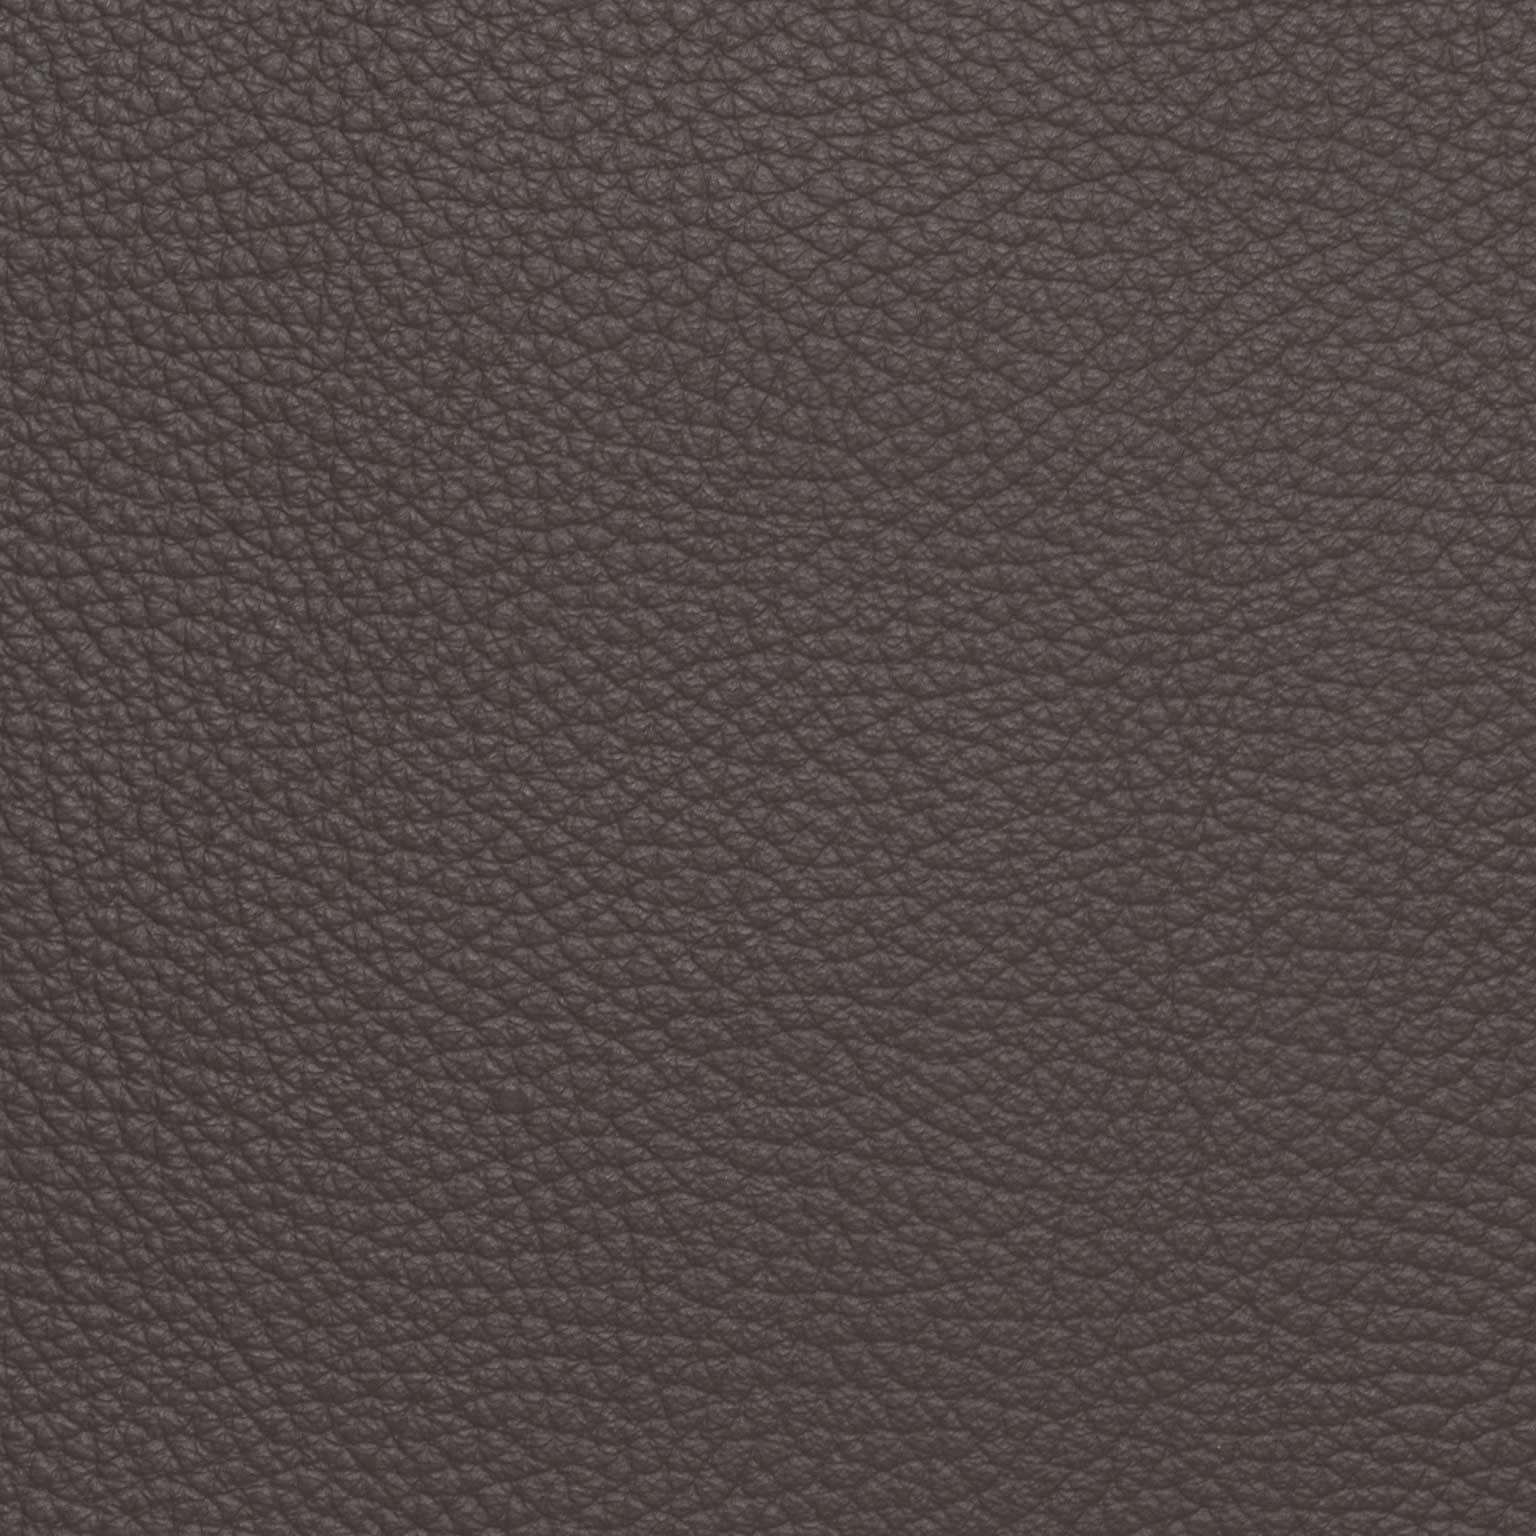 Ranchio leather_p11-009